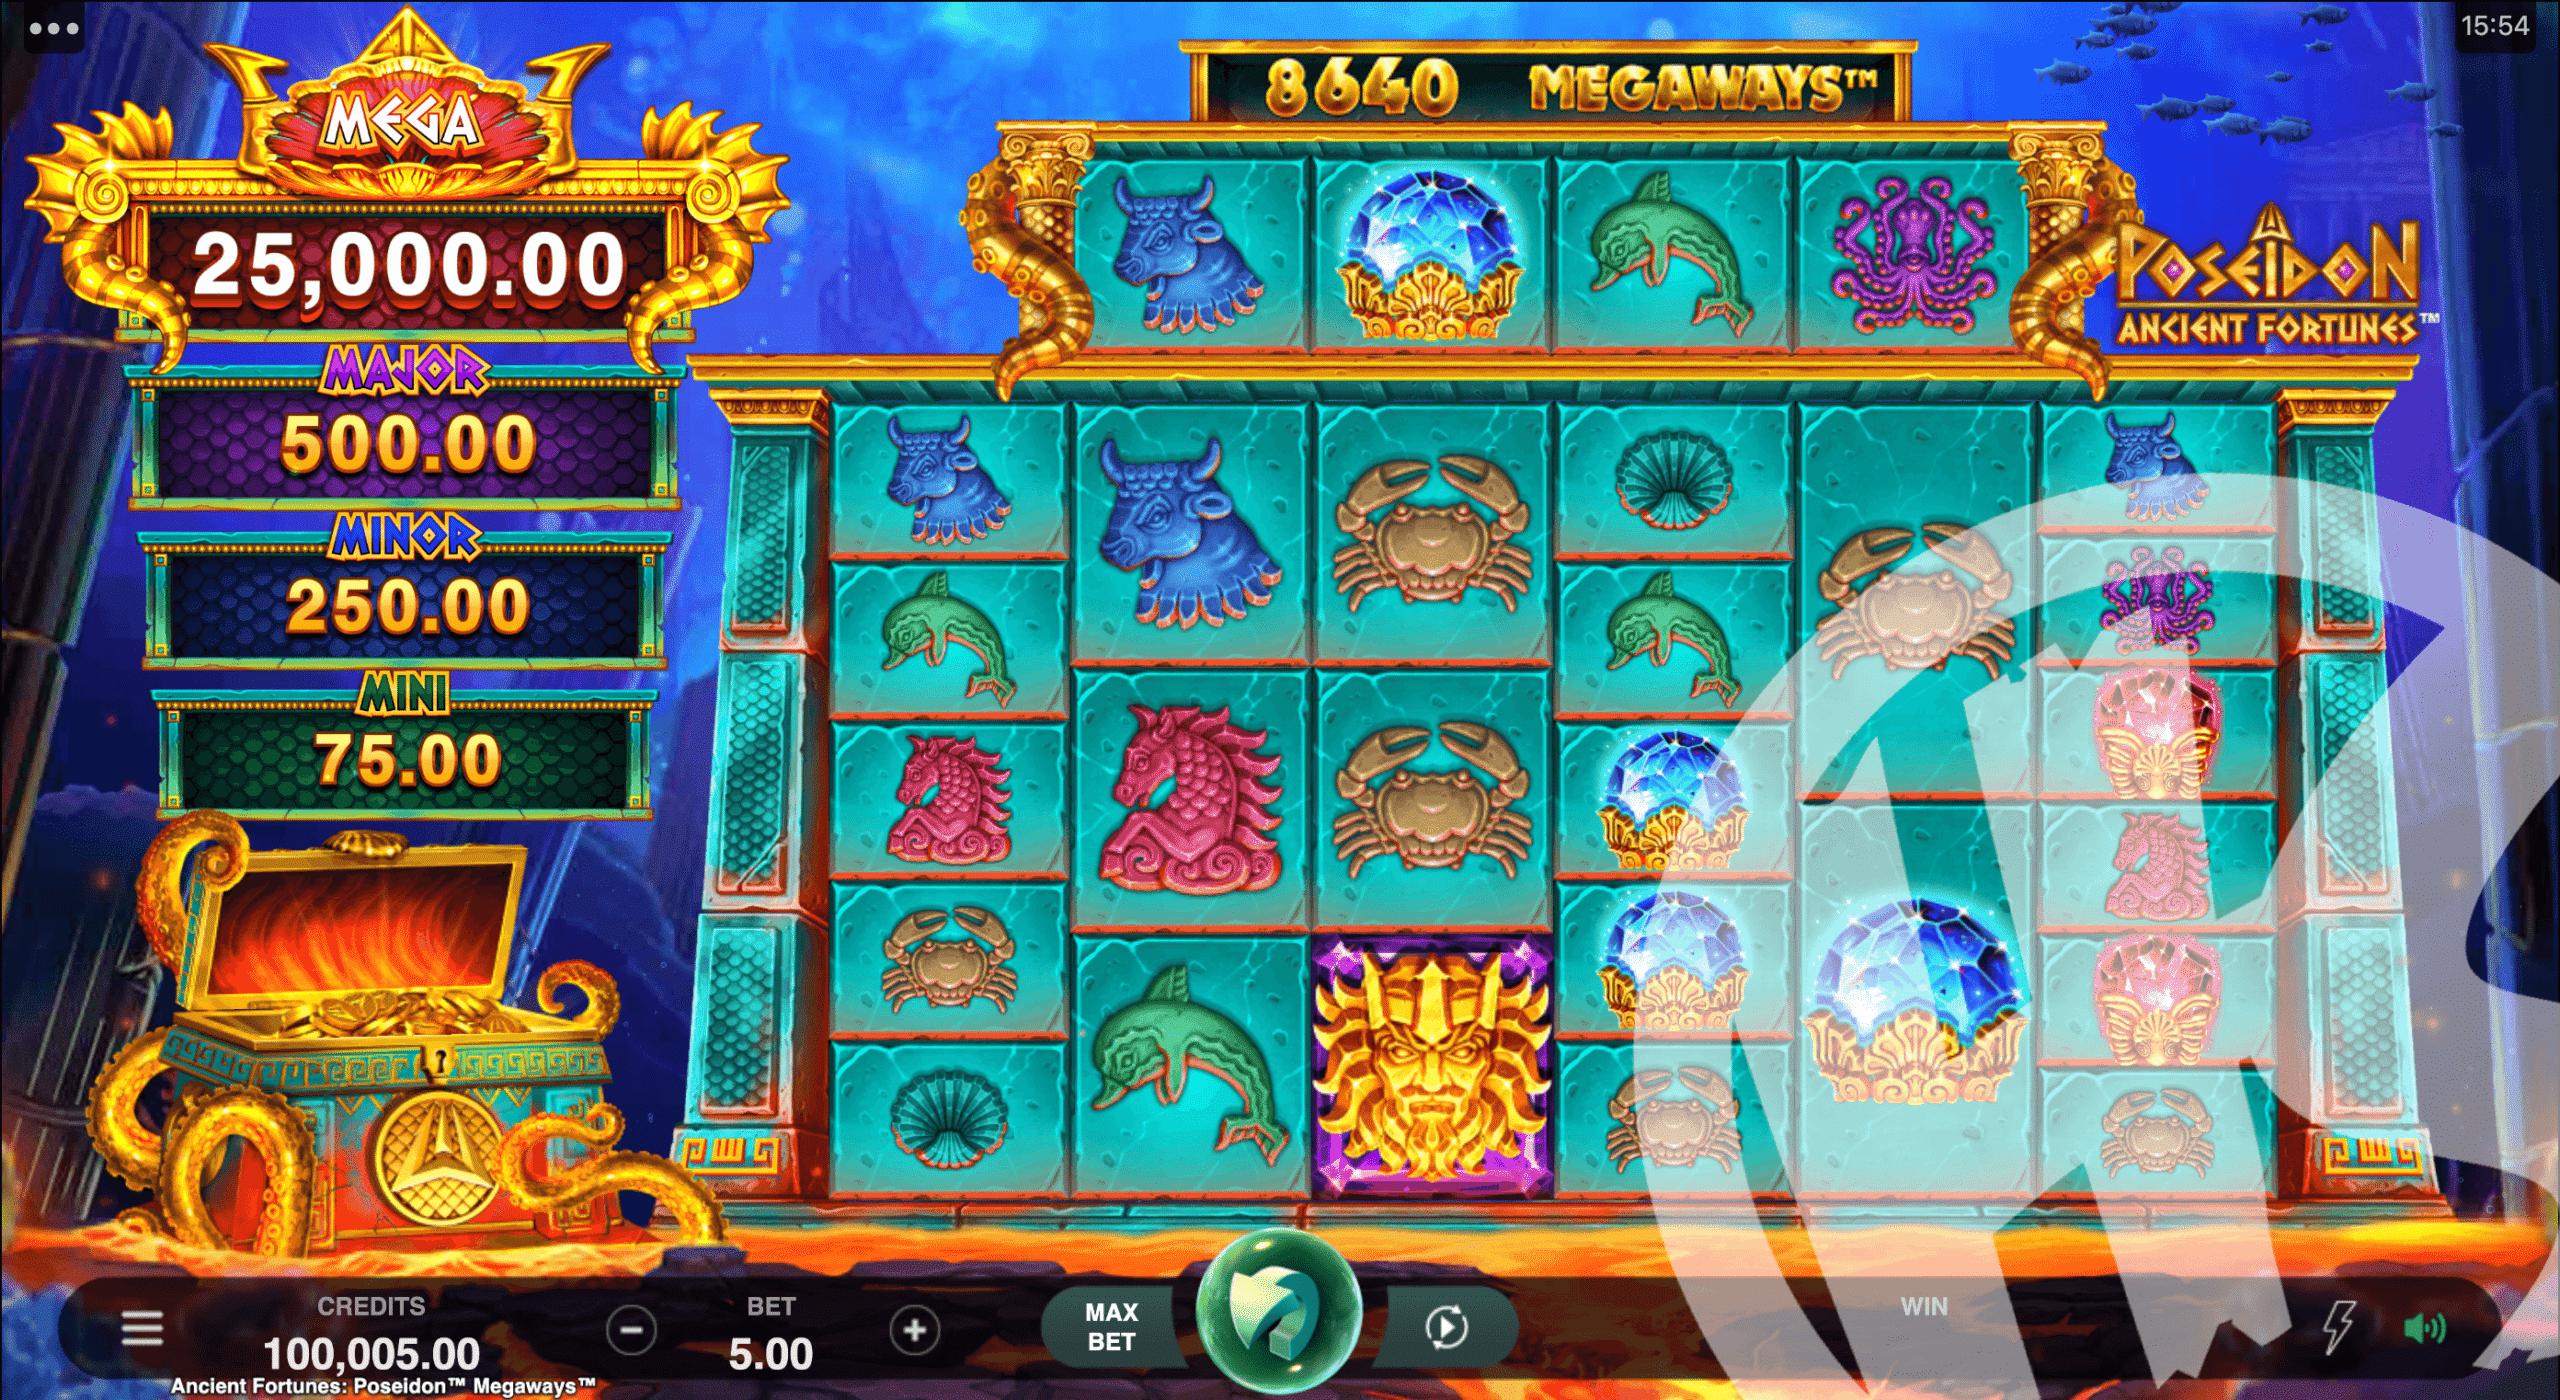 Poseidon Ancient Fortunes Megaways Base Game